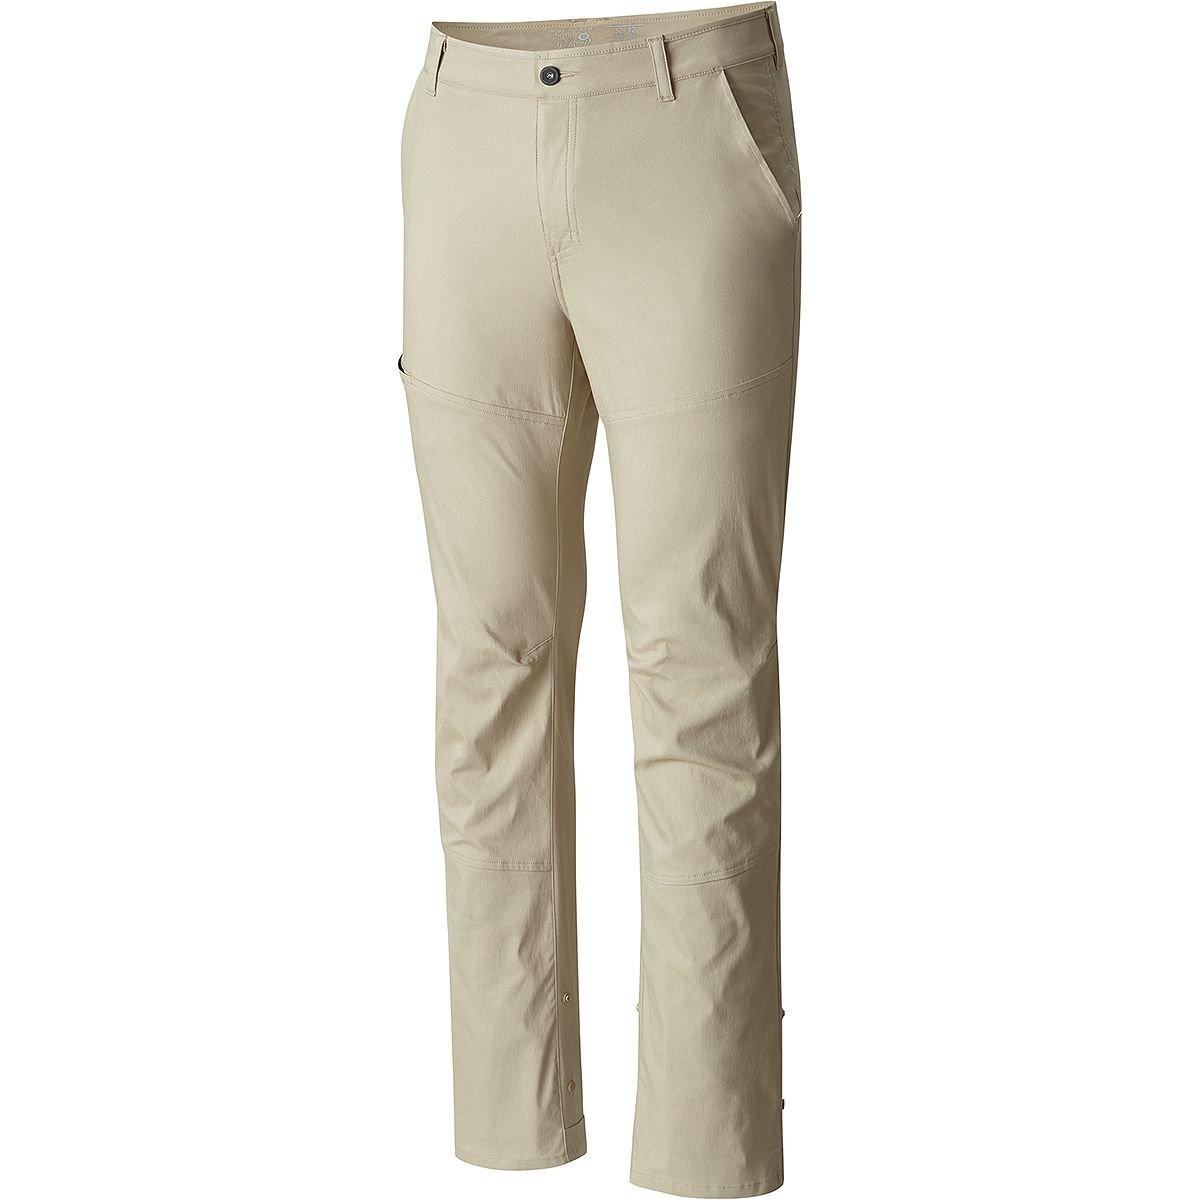 Mountain Hardwear Hardwear AP Pants – Men 's B073ZJFLDN 34